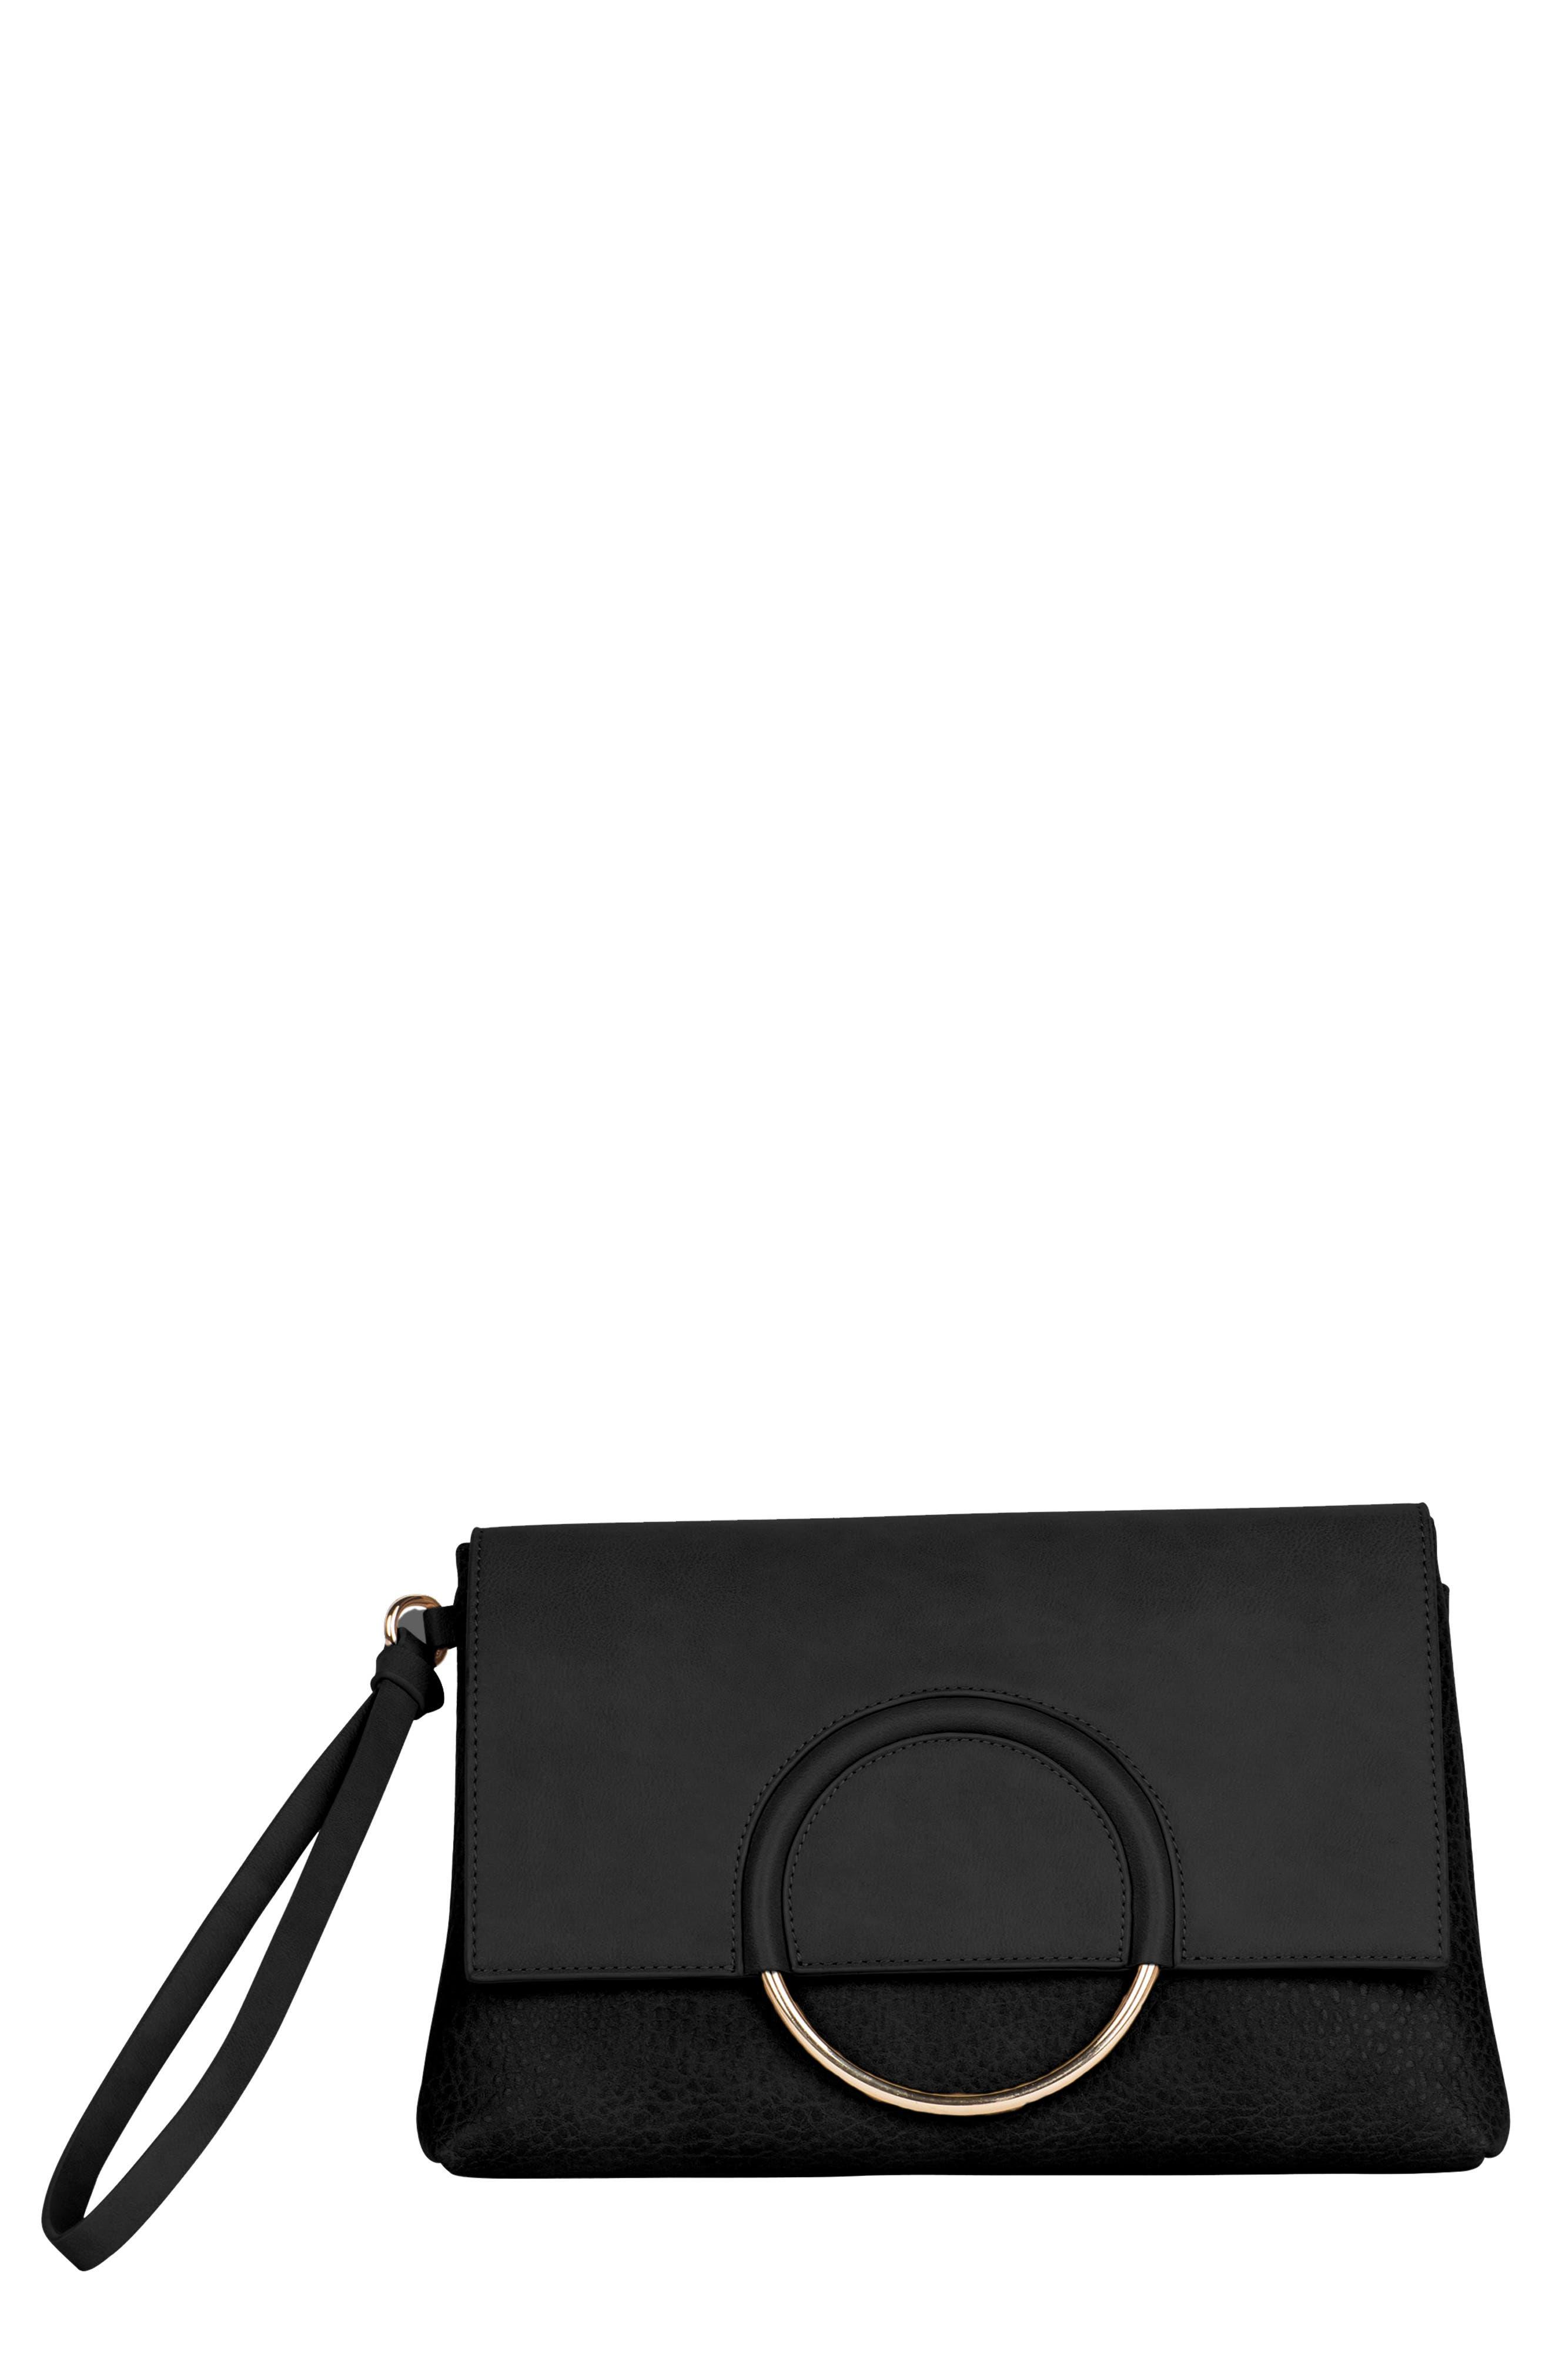 Custom Vegan Leather Wristlet Clutch,                             Main thumbnail 1, color,                             BLACK